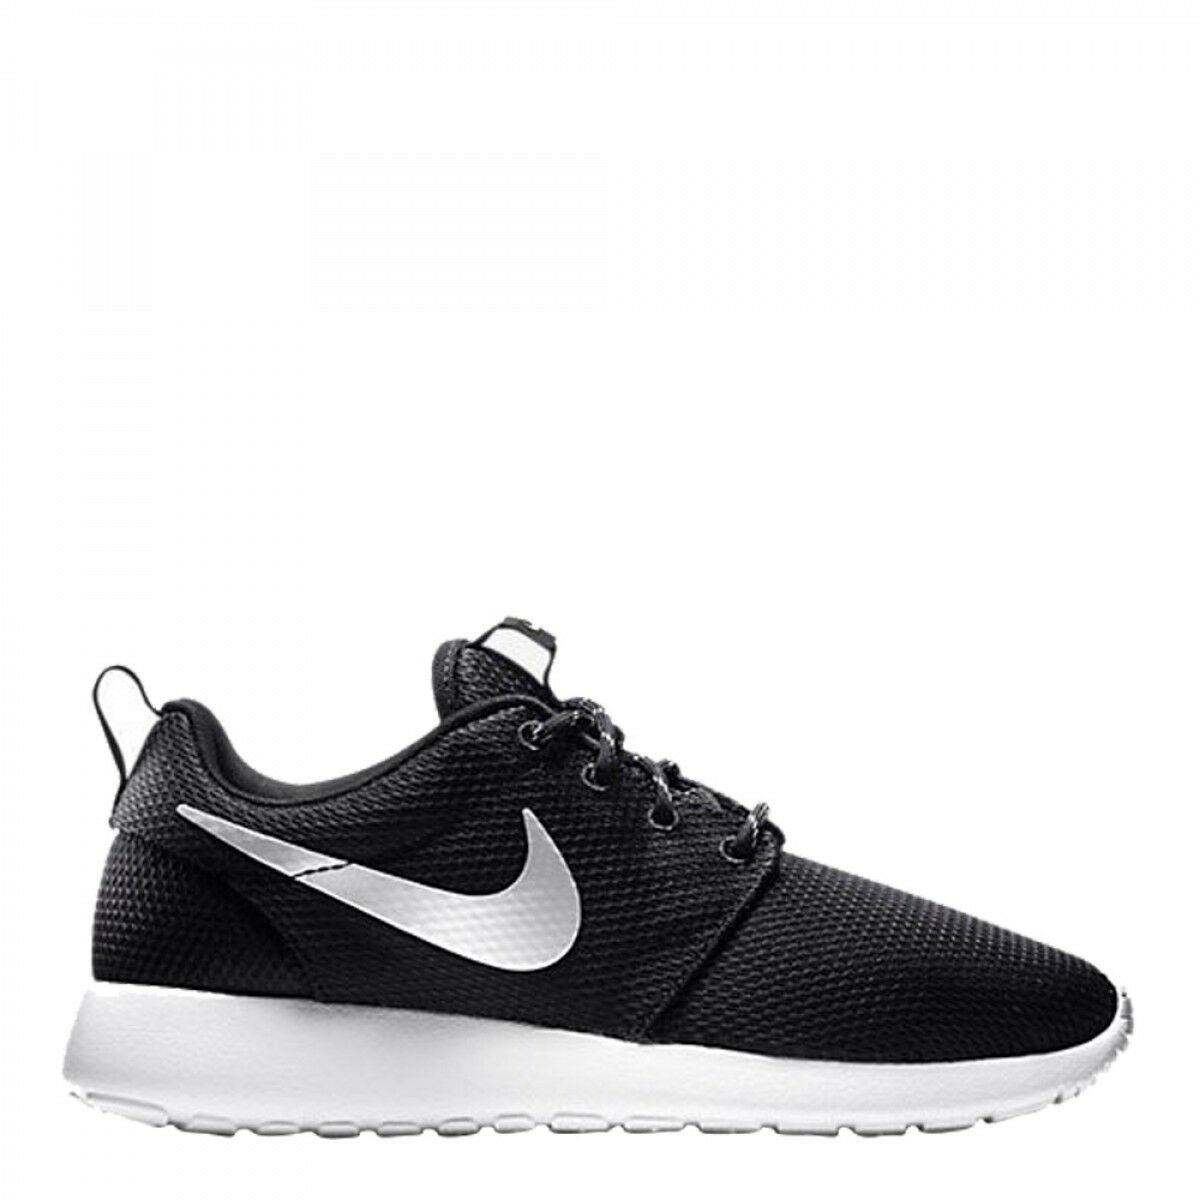 Nike Women's ROSHE ONE Shoes NEW AUTHENTIC Black/Platinum/White 511882-094